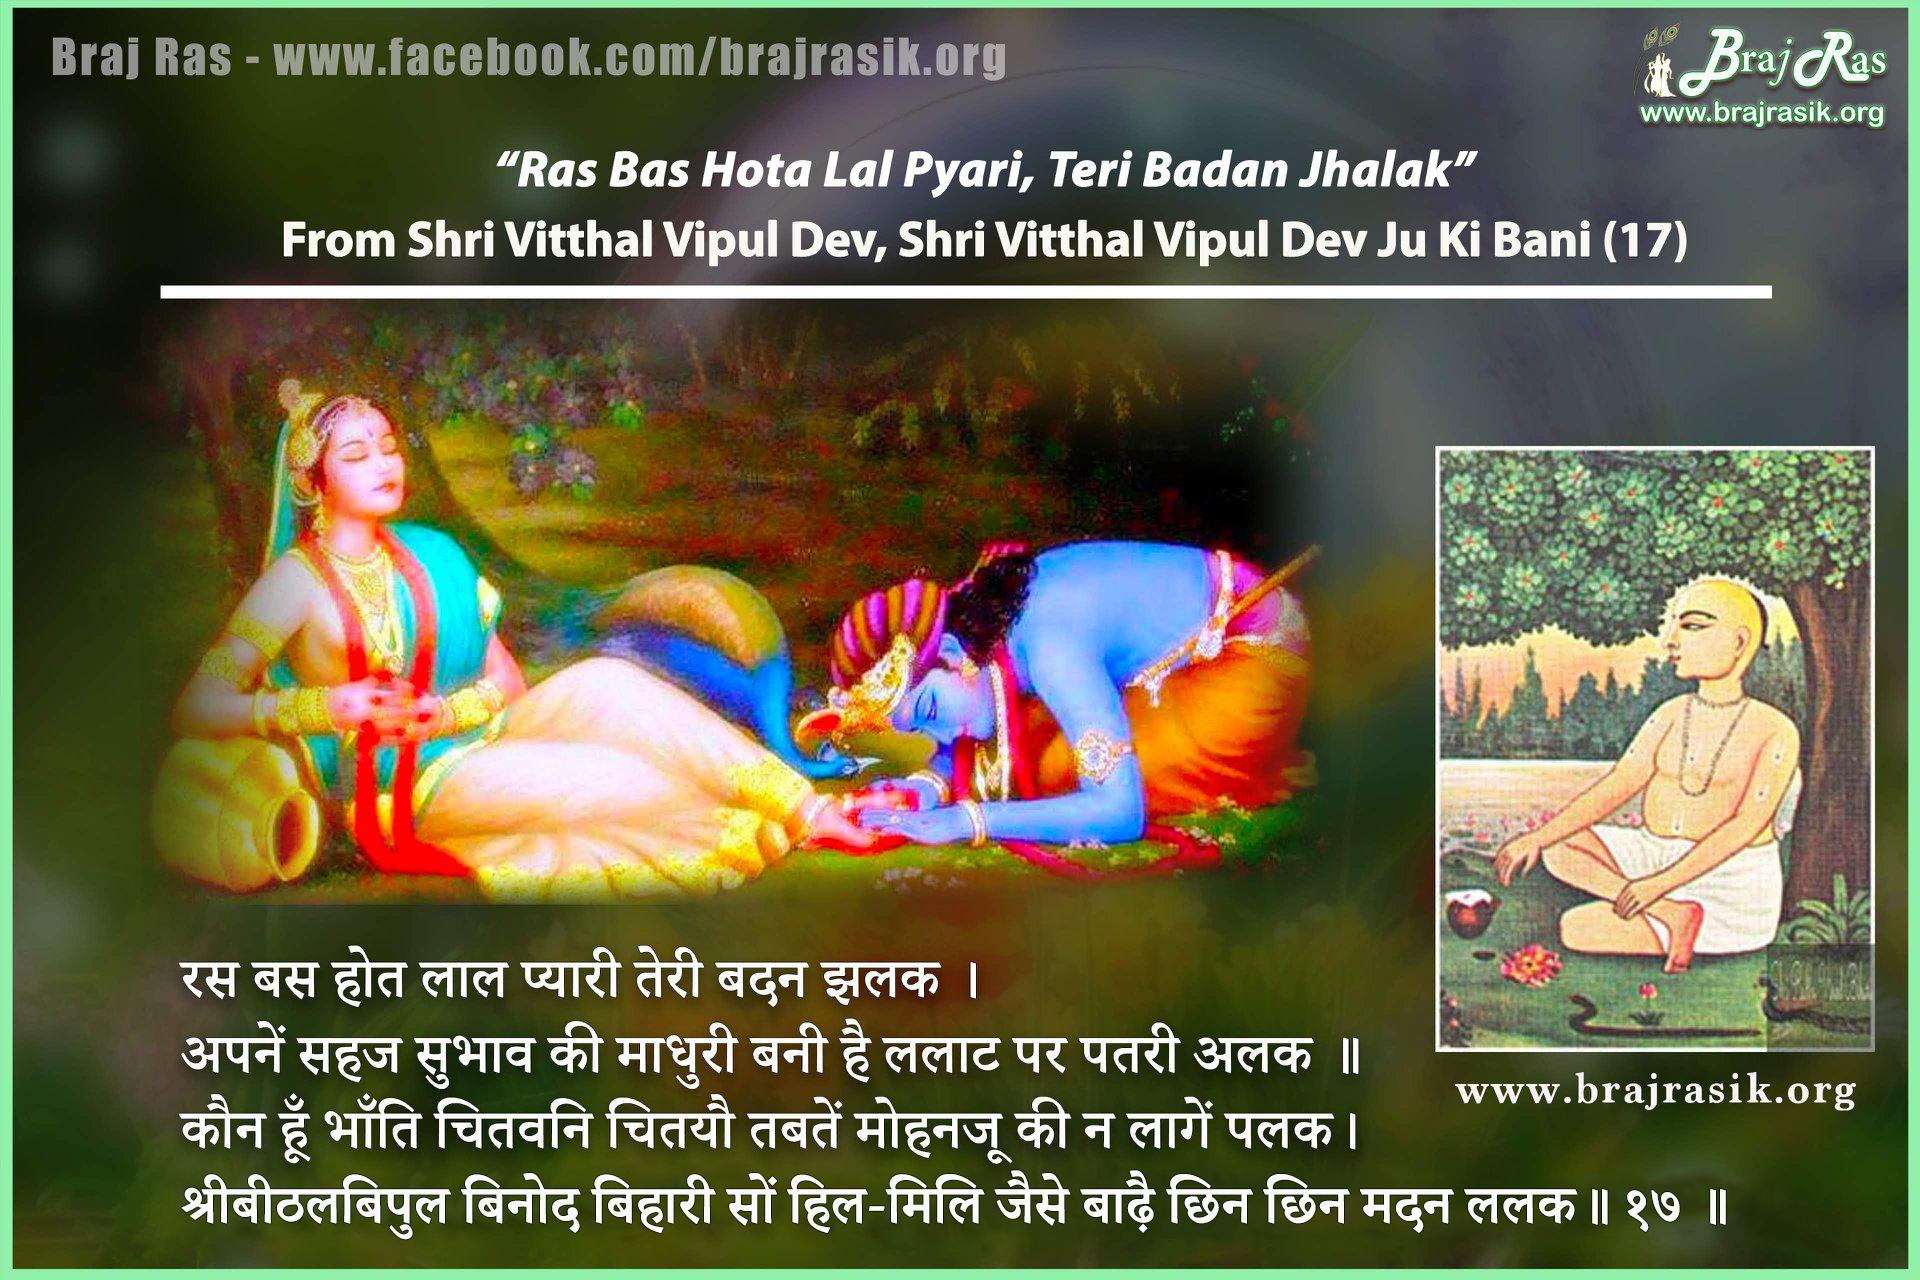 Ras Bas Hota Laal Pyari  - Shri Vitthal Vipul Dev Ji